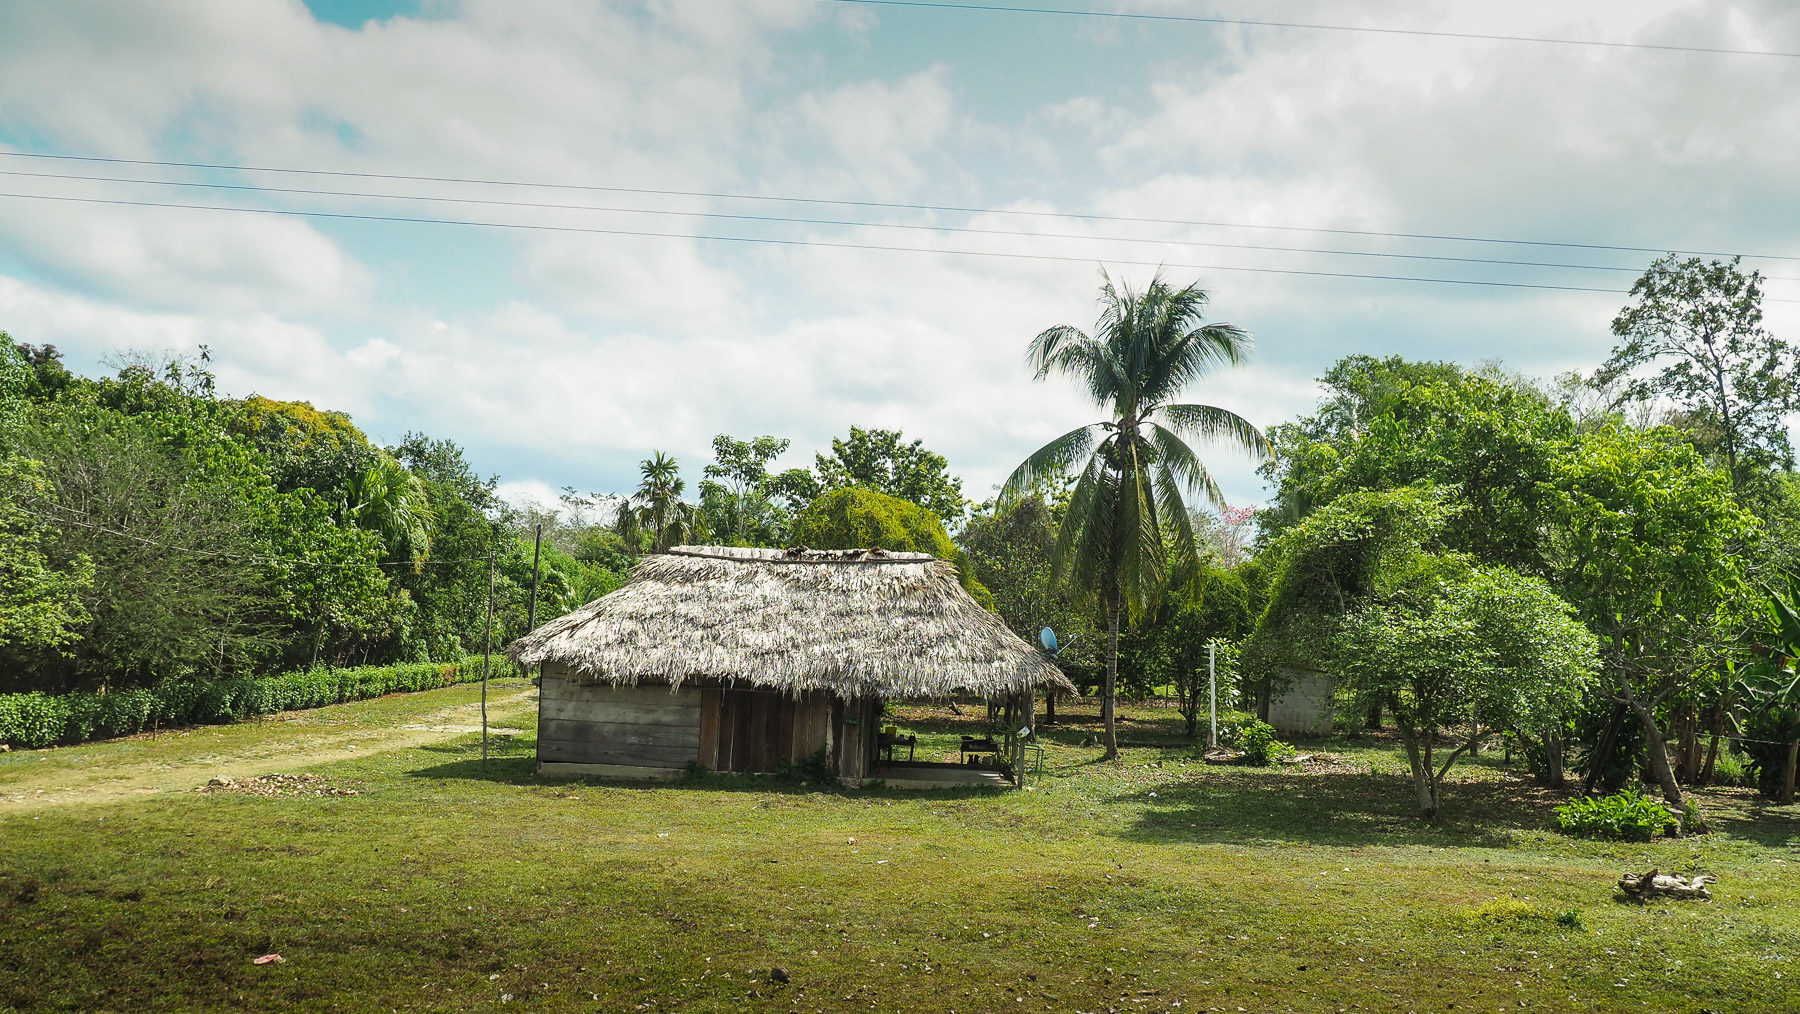 Einfache, saubere, nette Dörfer in Chiapas